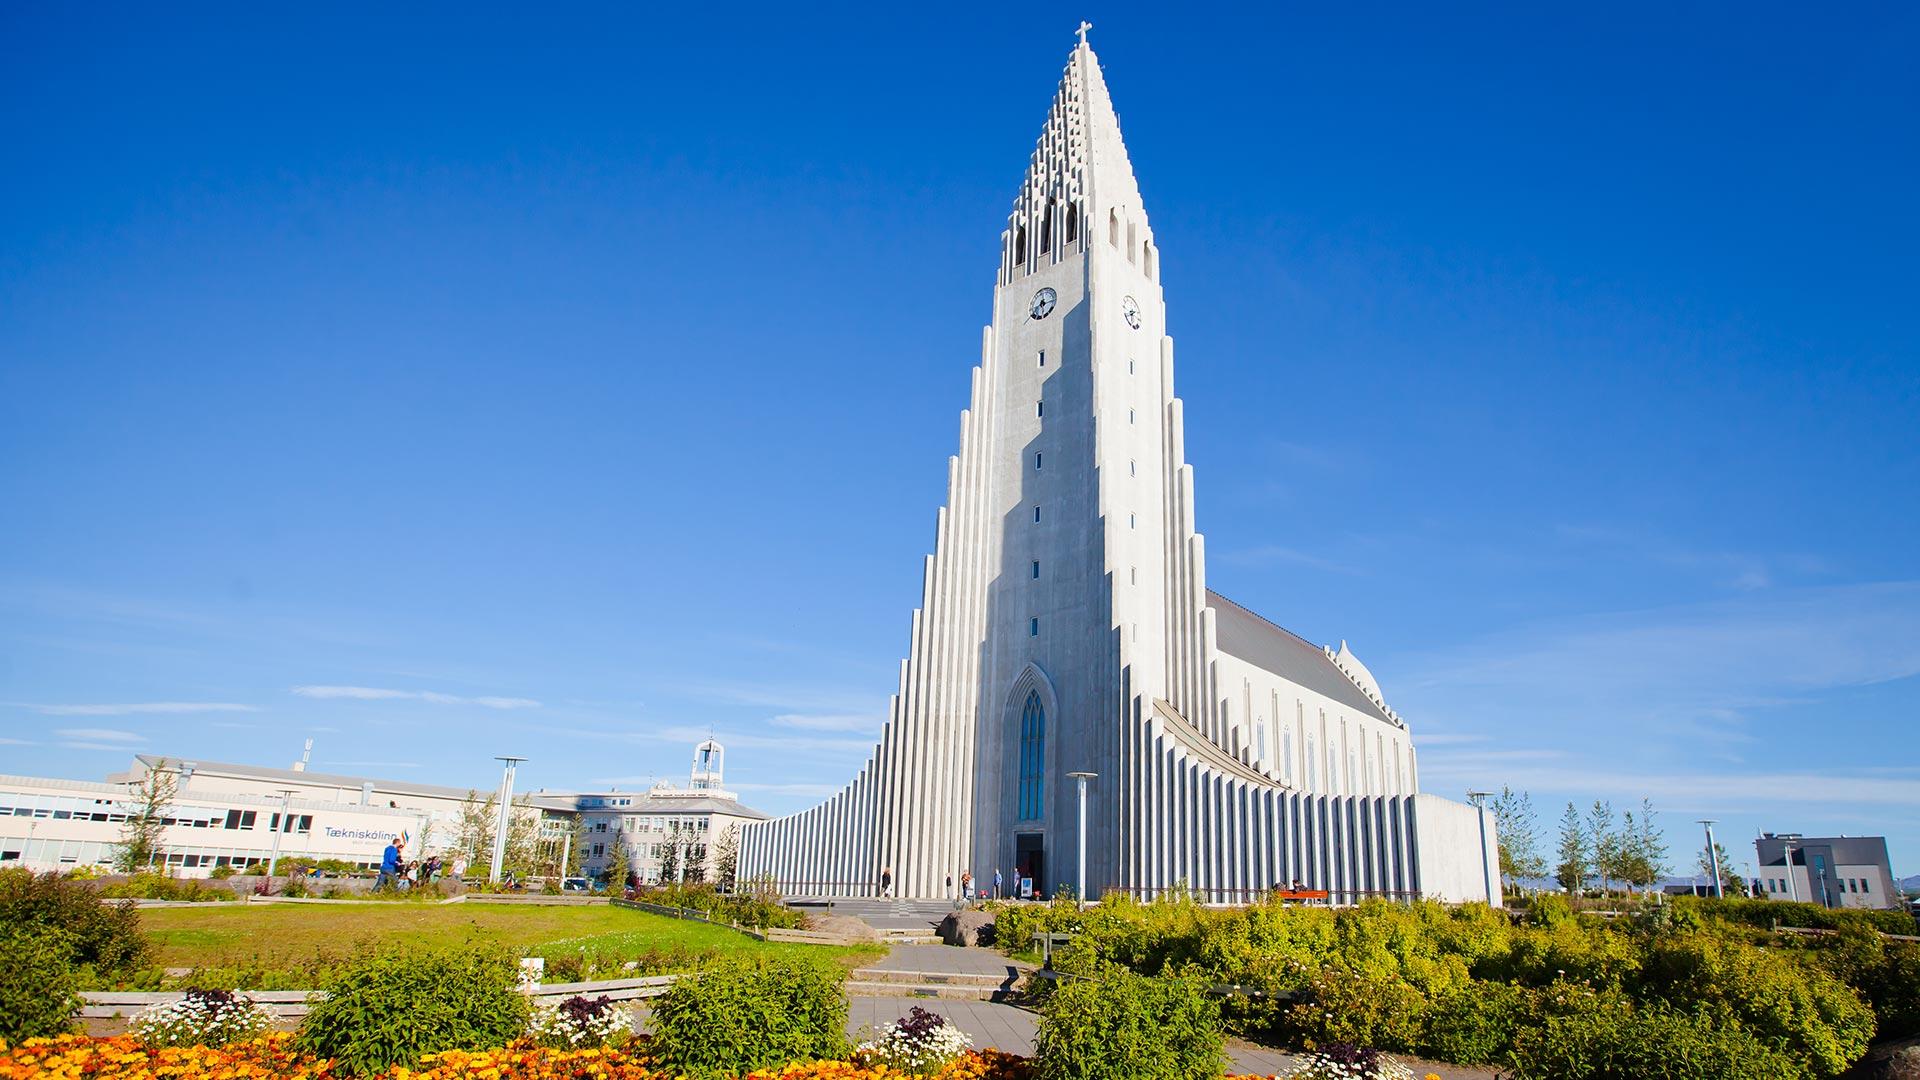 Hallgrímskirkja church : Reykjavik : Travel Guide : Nordic Visitor